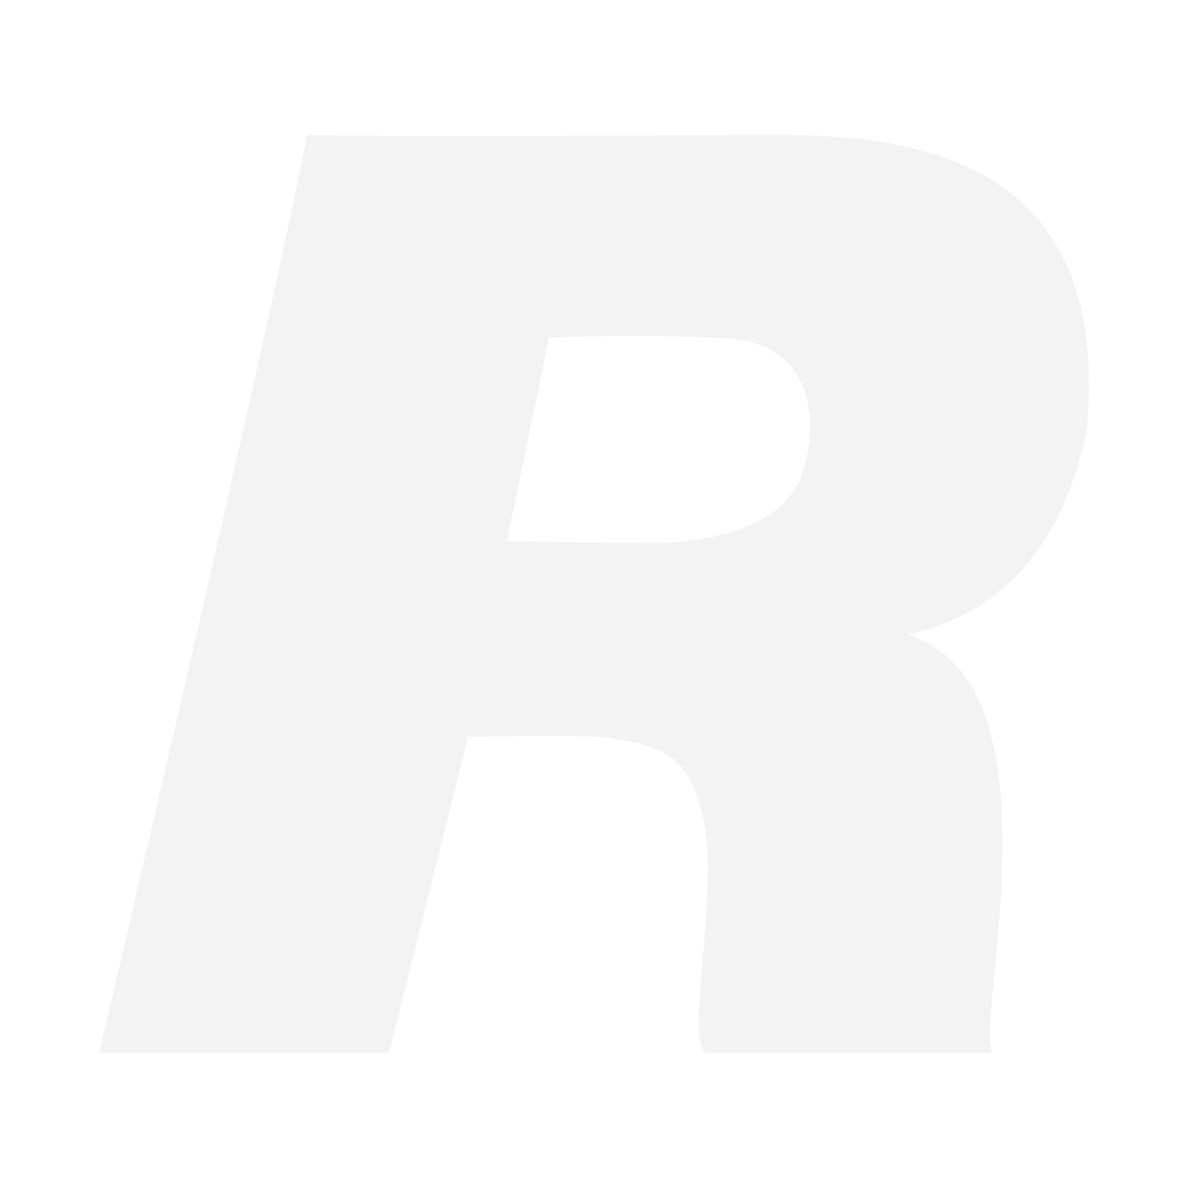 GoPro Hero 5 Black + Lowepro Dashpoint AVC1